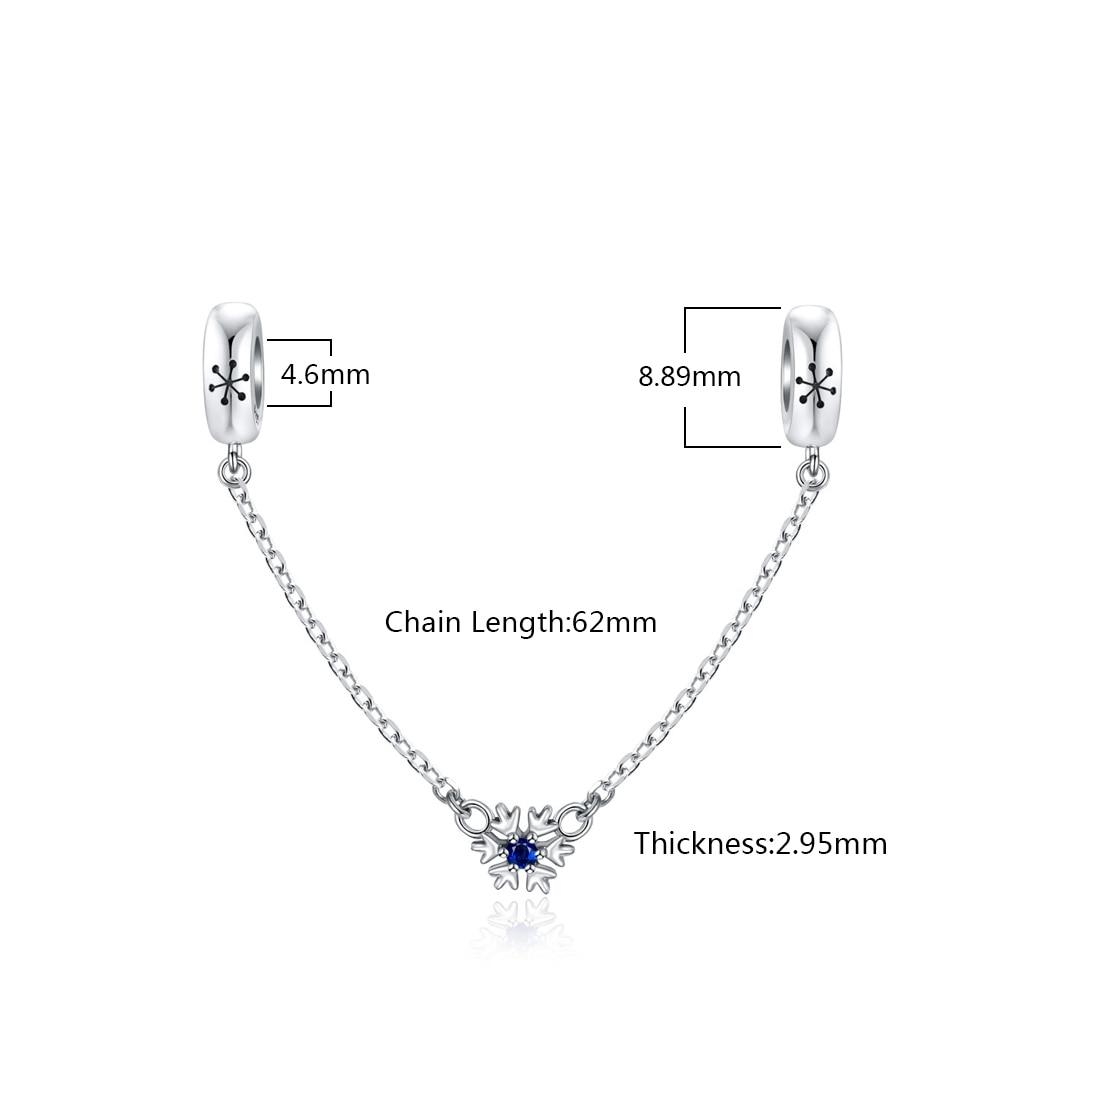 Nouveau 925 Sterling Silver Snowflake Zircon Charm Bead Jewelry Fit Chaîne Noël